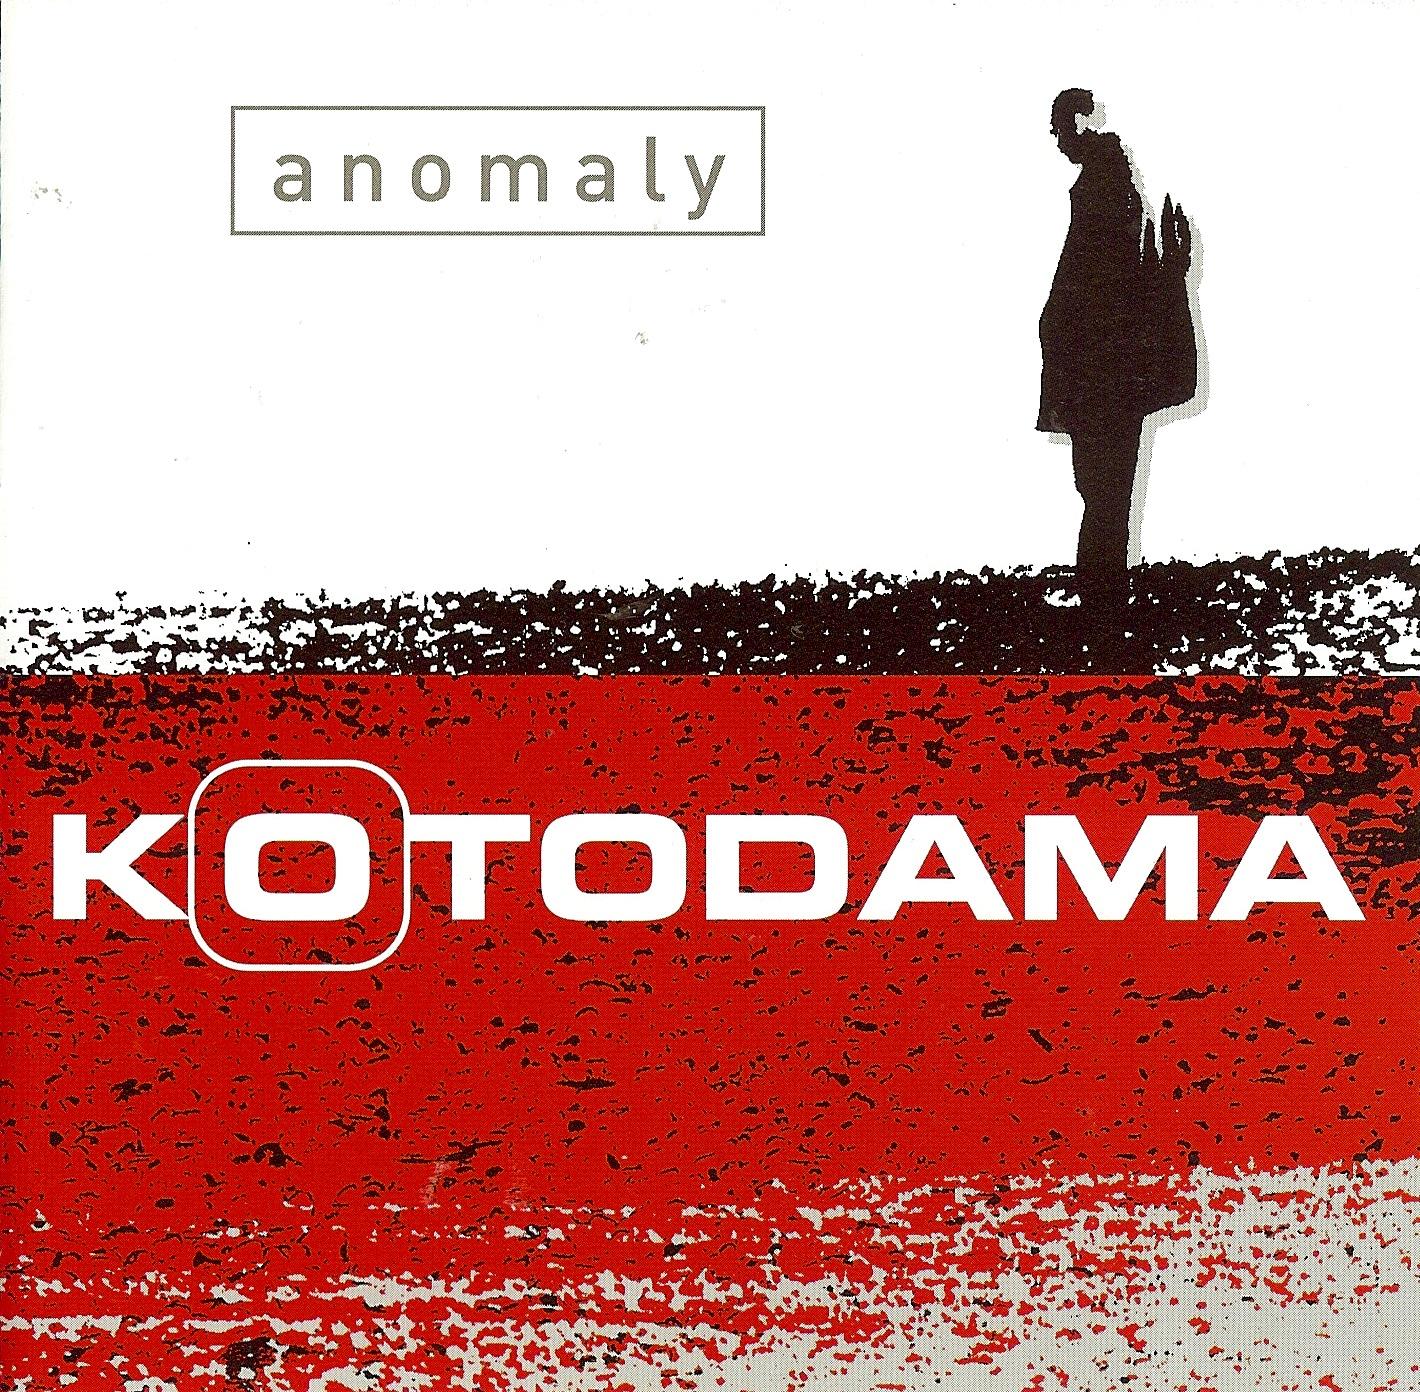 KotoDama_Anomaly.jpeg